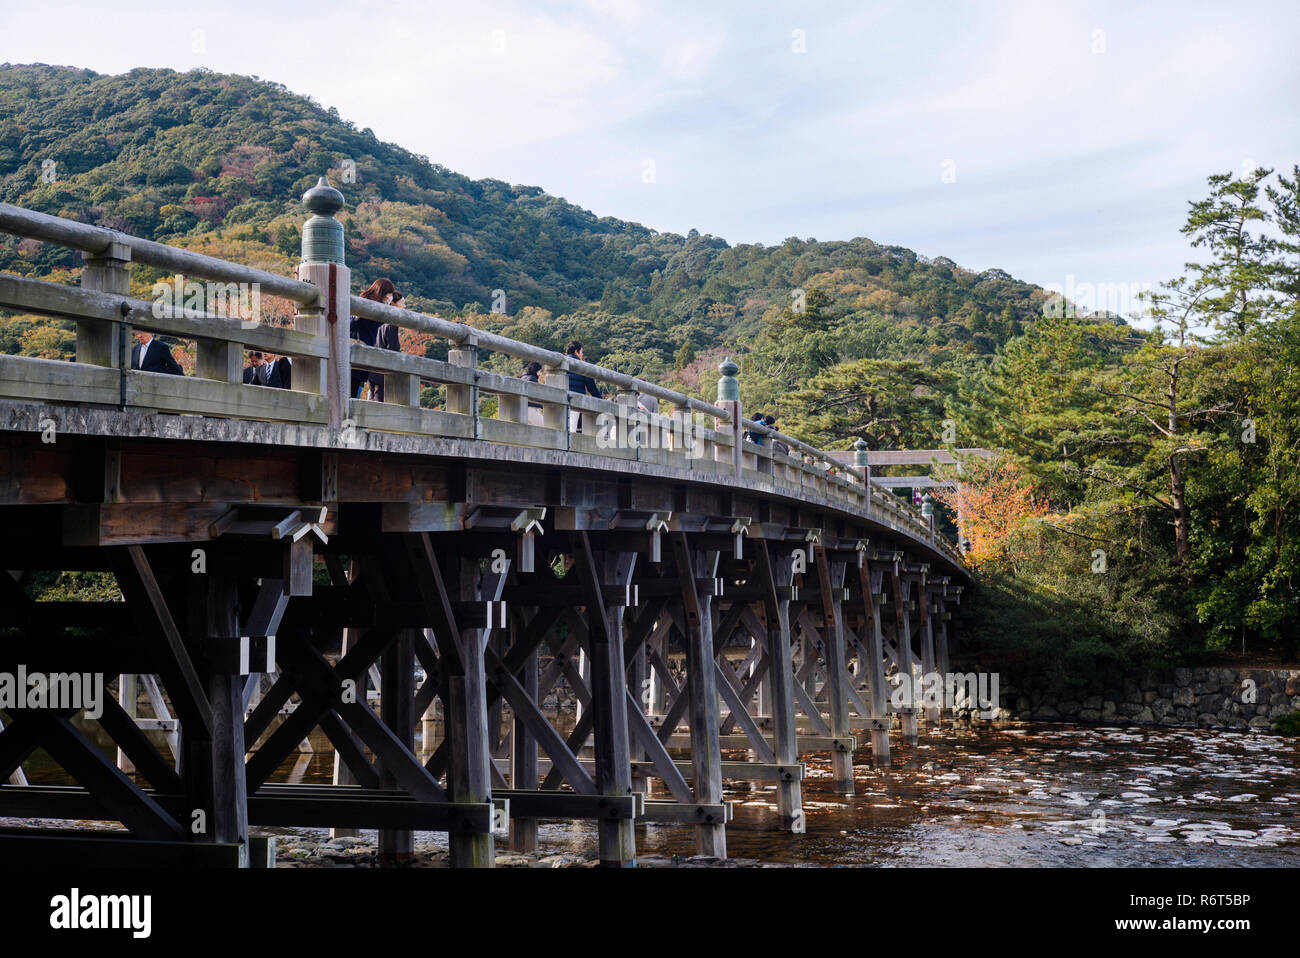 The Uji bridge over Isuzu river leading to the Inner Shrine (Naiku) (Ise Grand Shrine, Mie Prefecture, Japan) - Stock Image